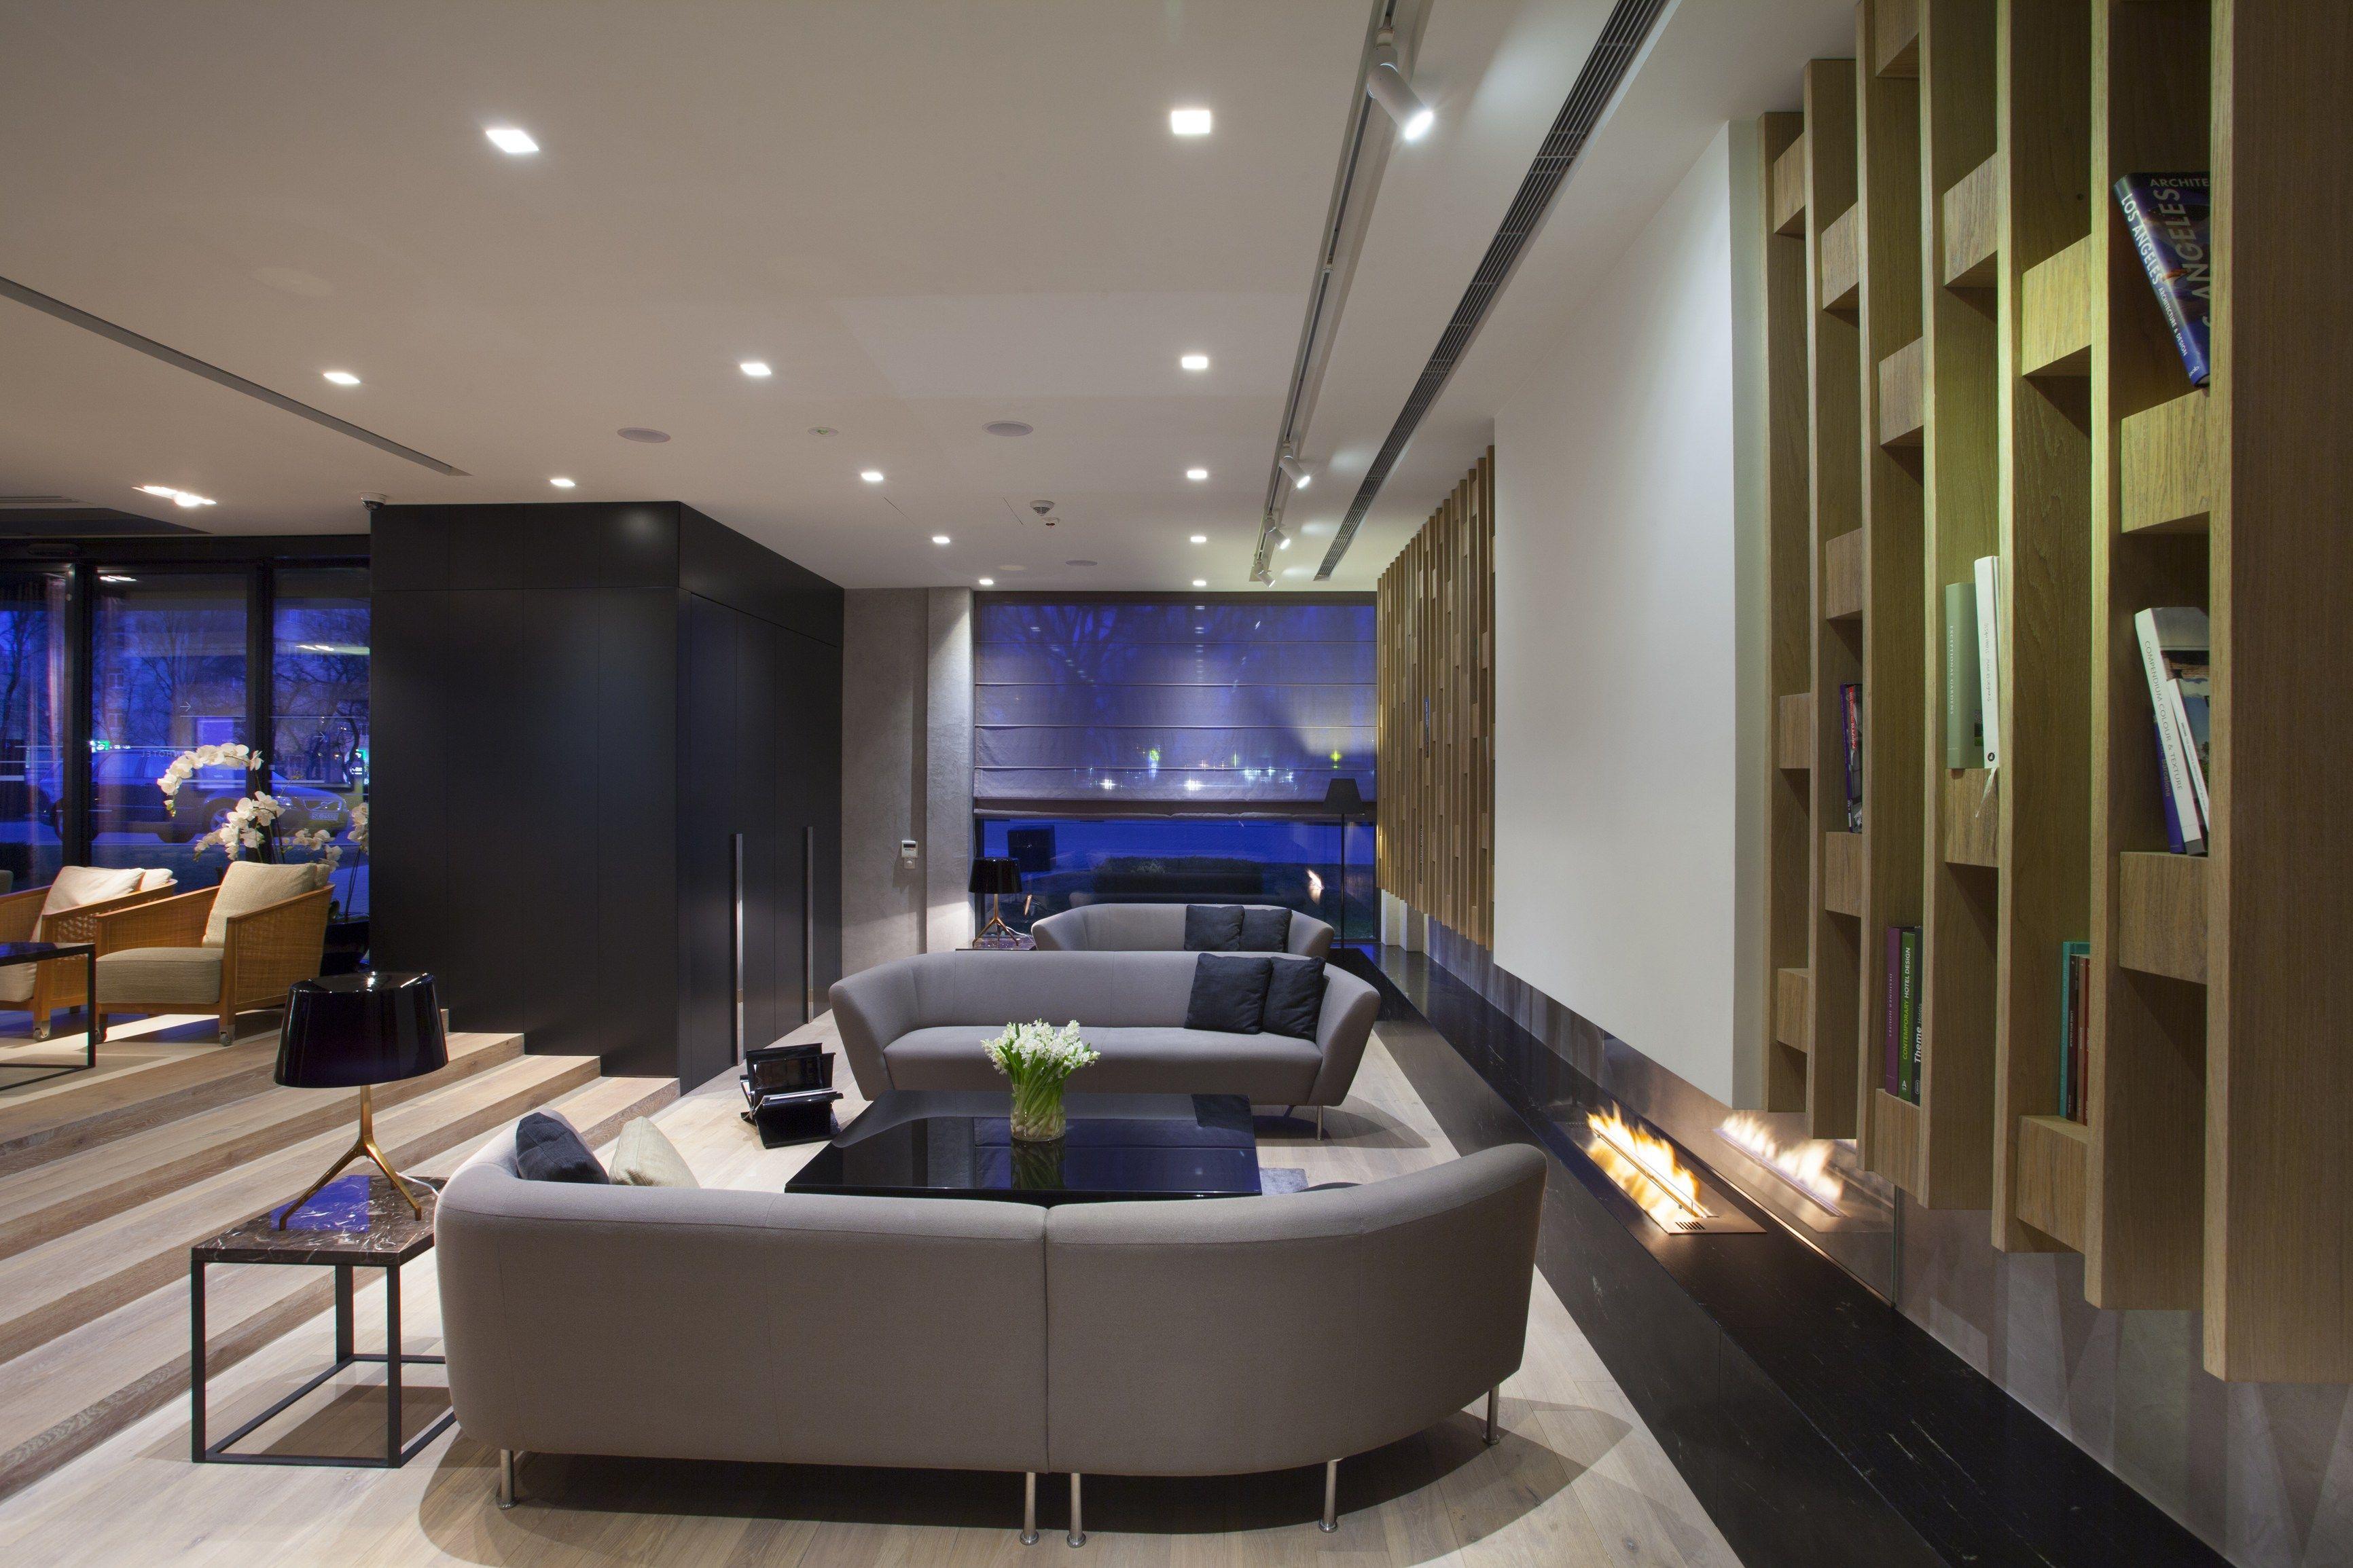 Bioethanol Fireplace insert FLA2 model E Architects line ...